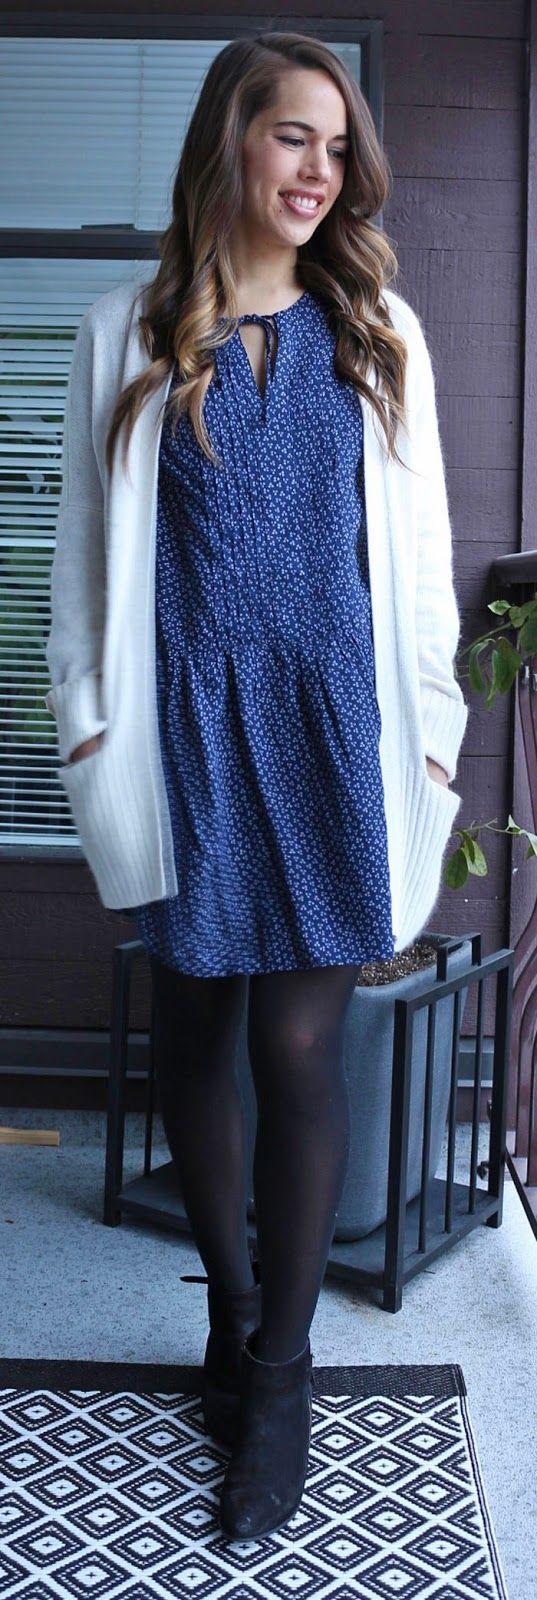 Jules in Flats - Talula Lenox Cardigan, Old Navy Pleated Tie-Neck Dress, Steve Madden Jaydun Booties